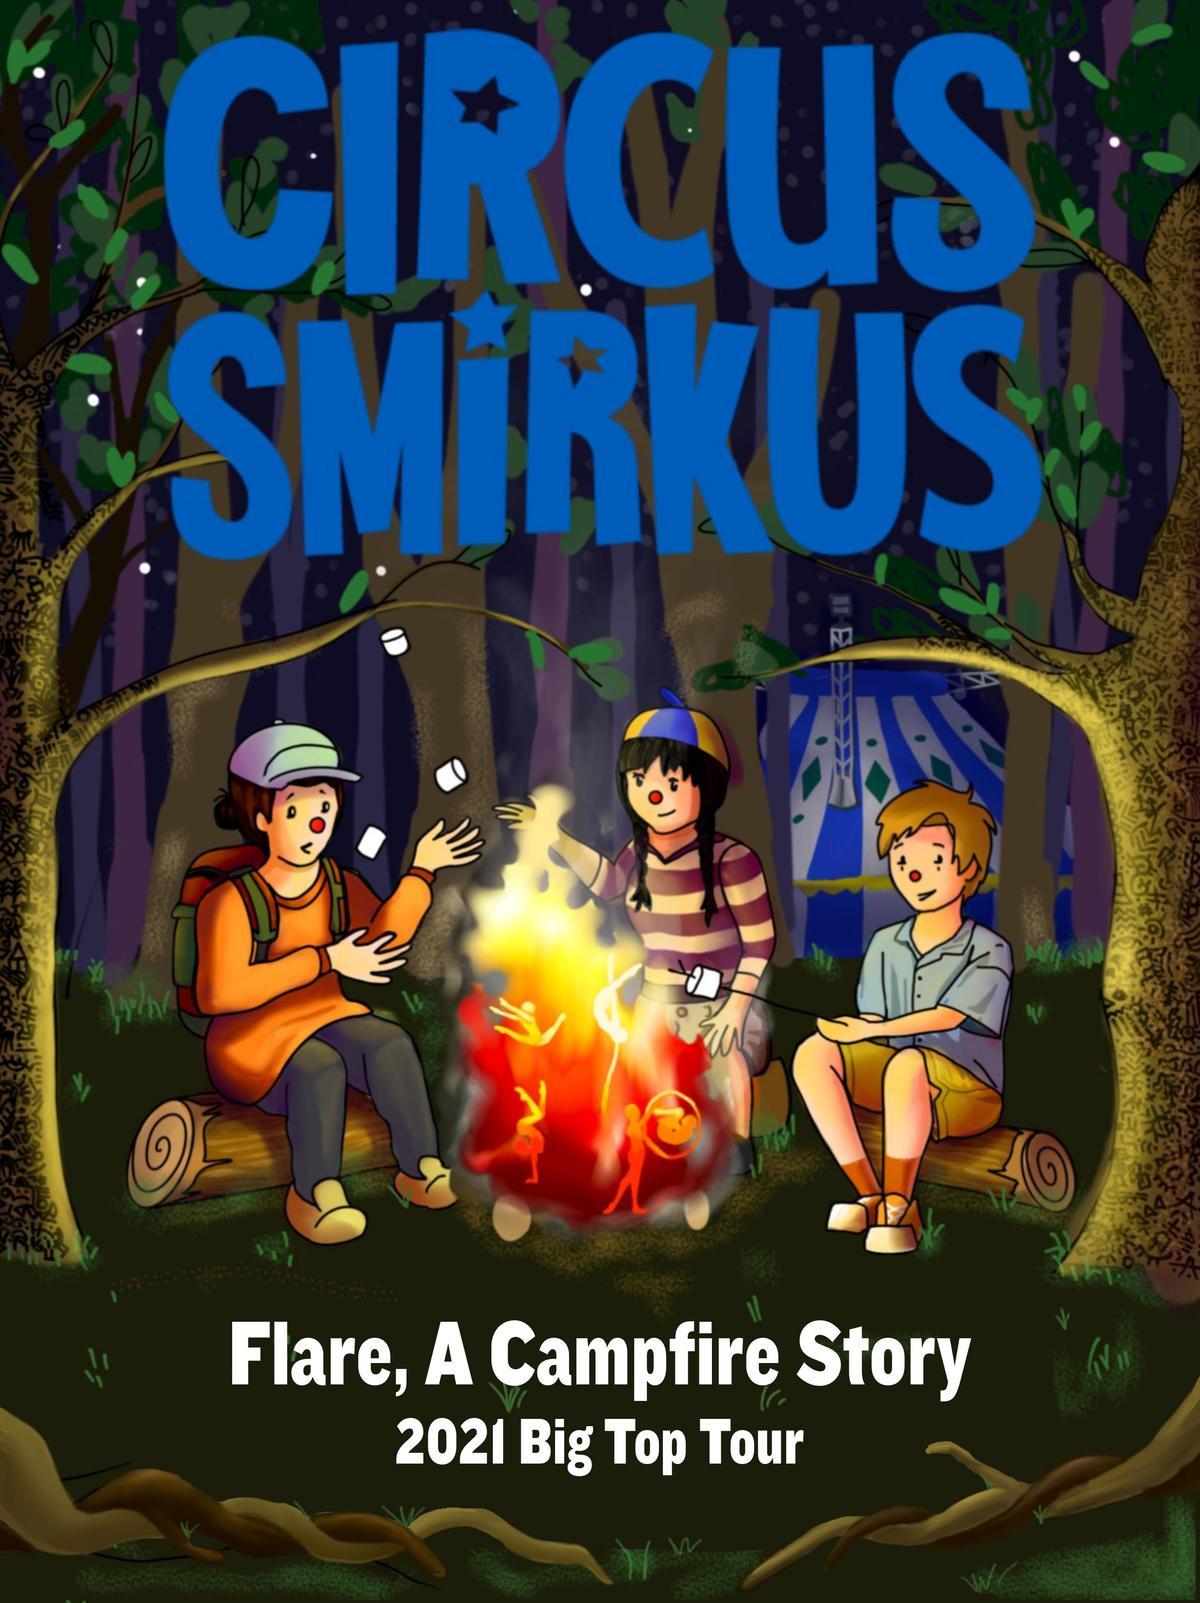 Circus Smirkus presents Flare, A Campfire Story - Circus Events - CircusTalk